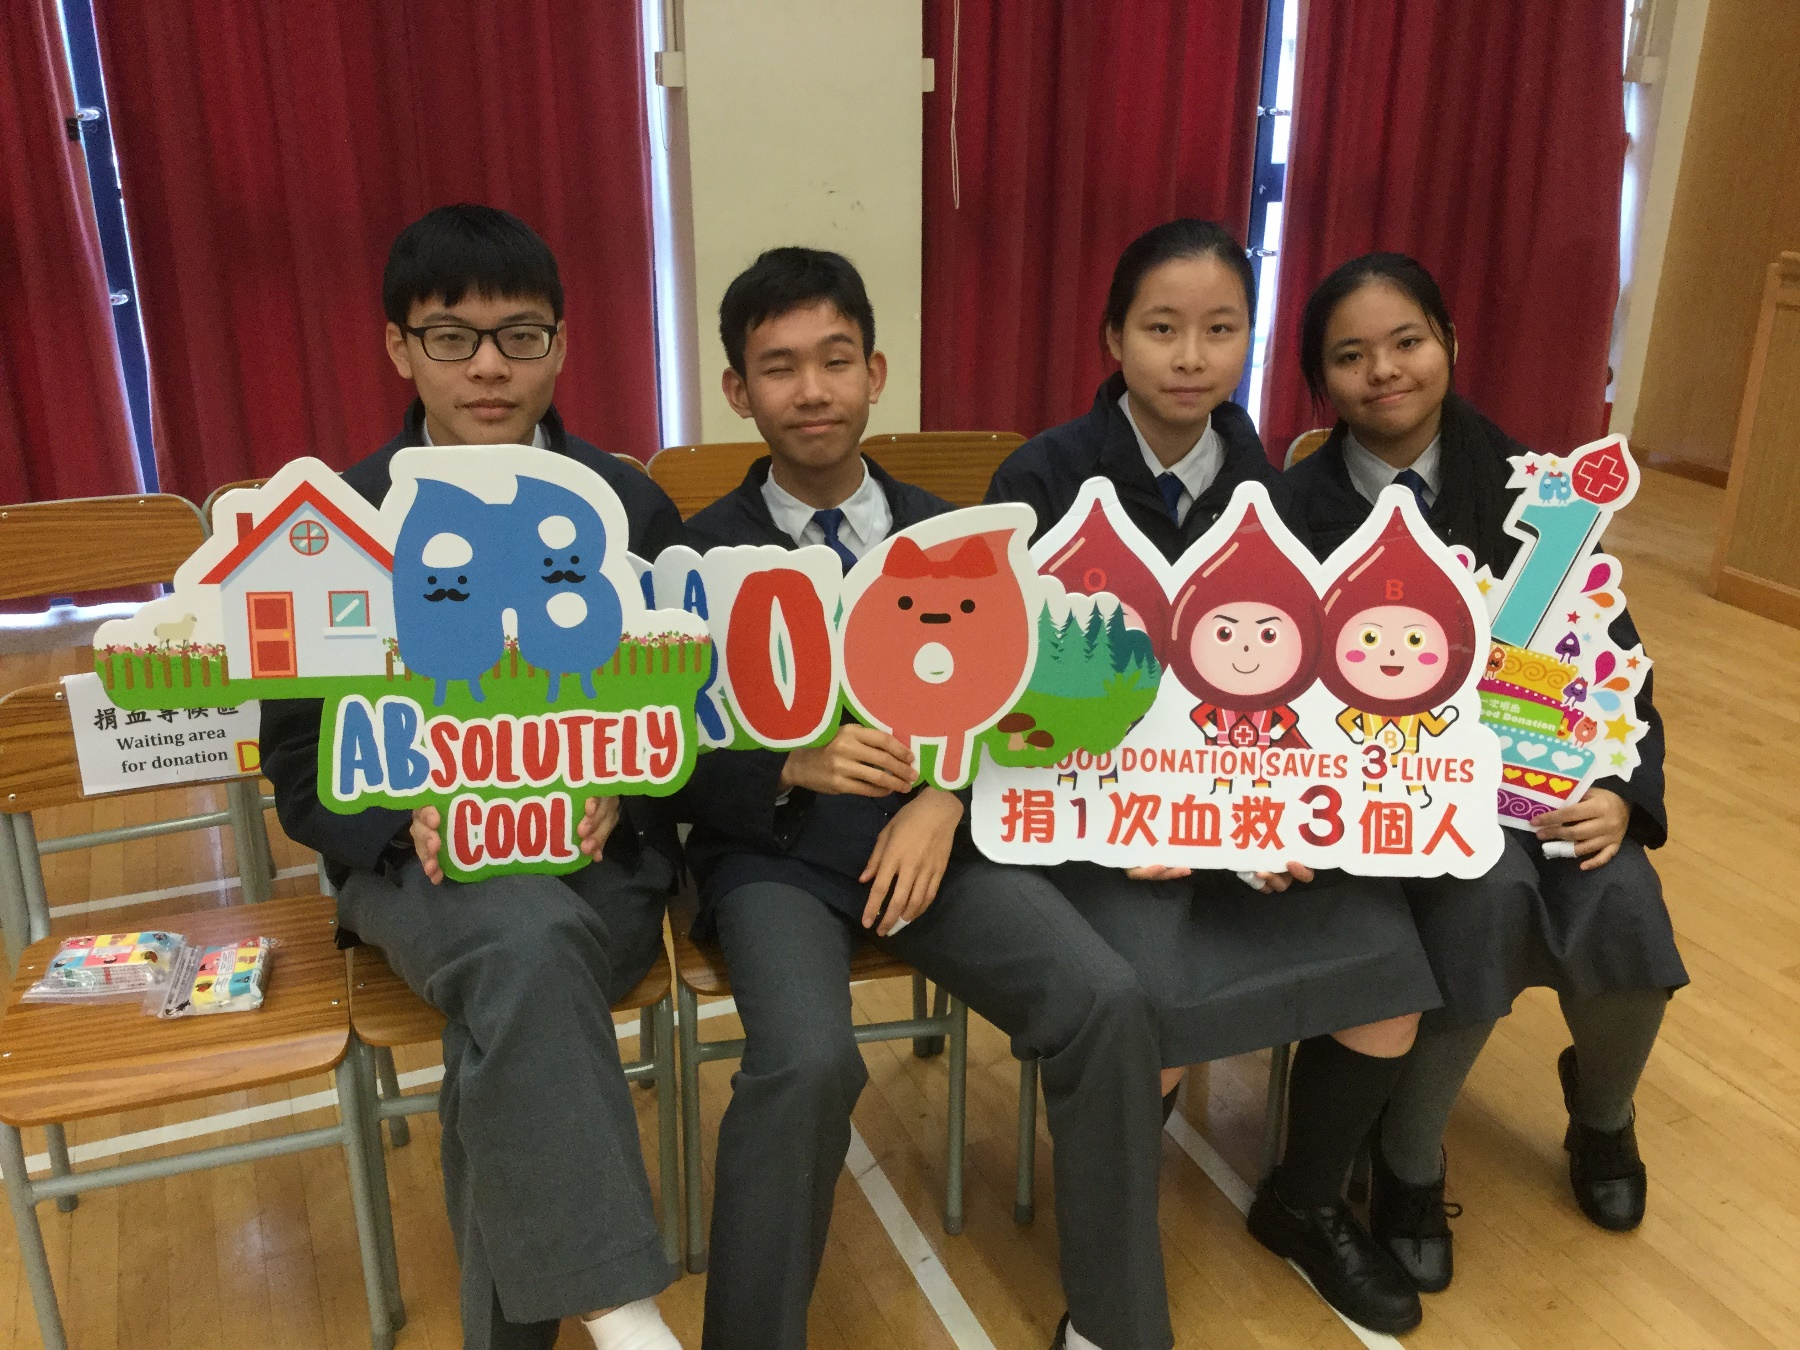 http://npc.edu.hk/sites/default/files/img_2474.jpg